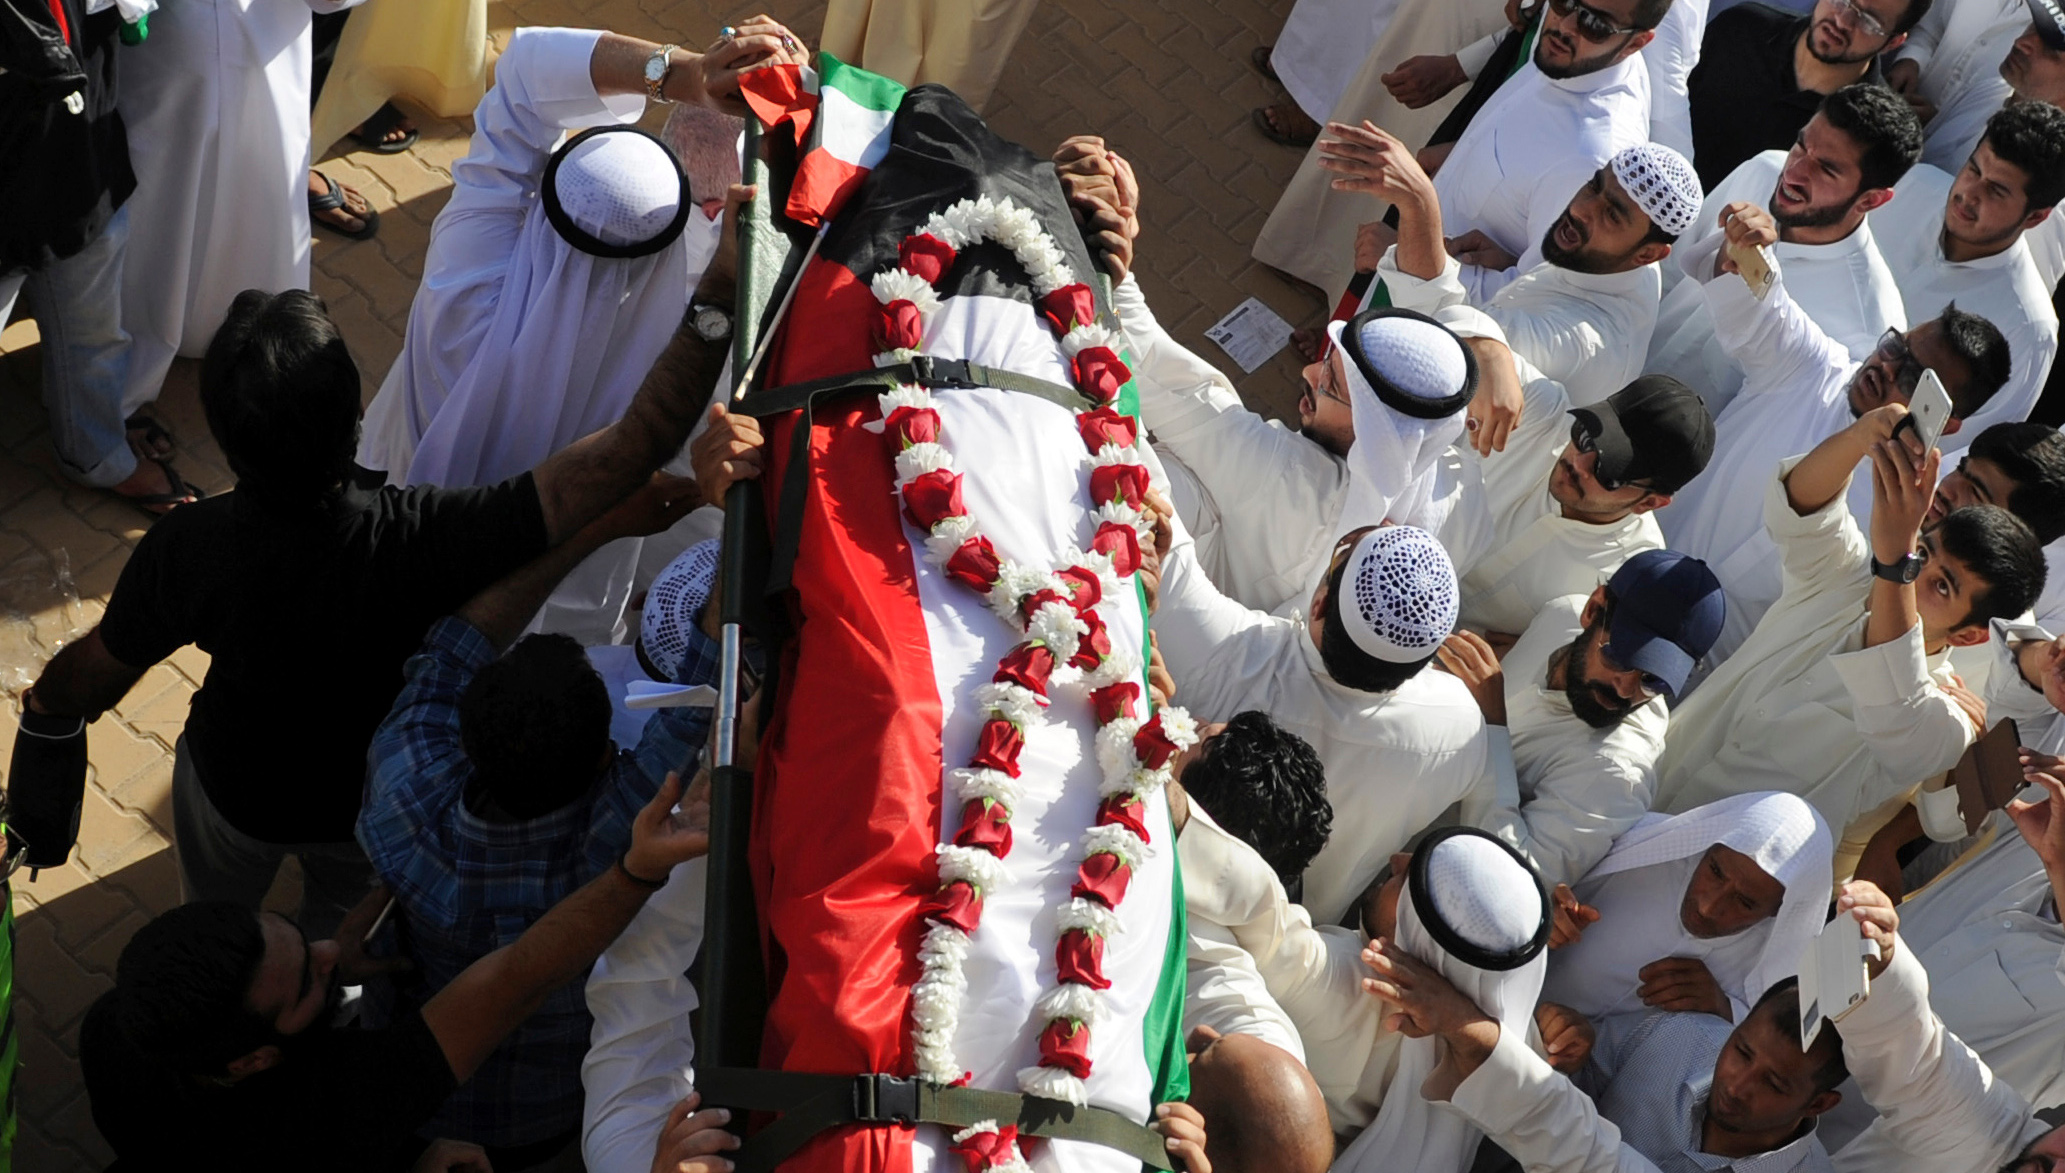 Regional Turmoil Threatens Kuwait's Calm